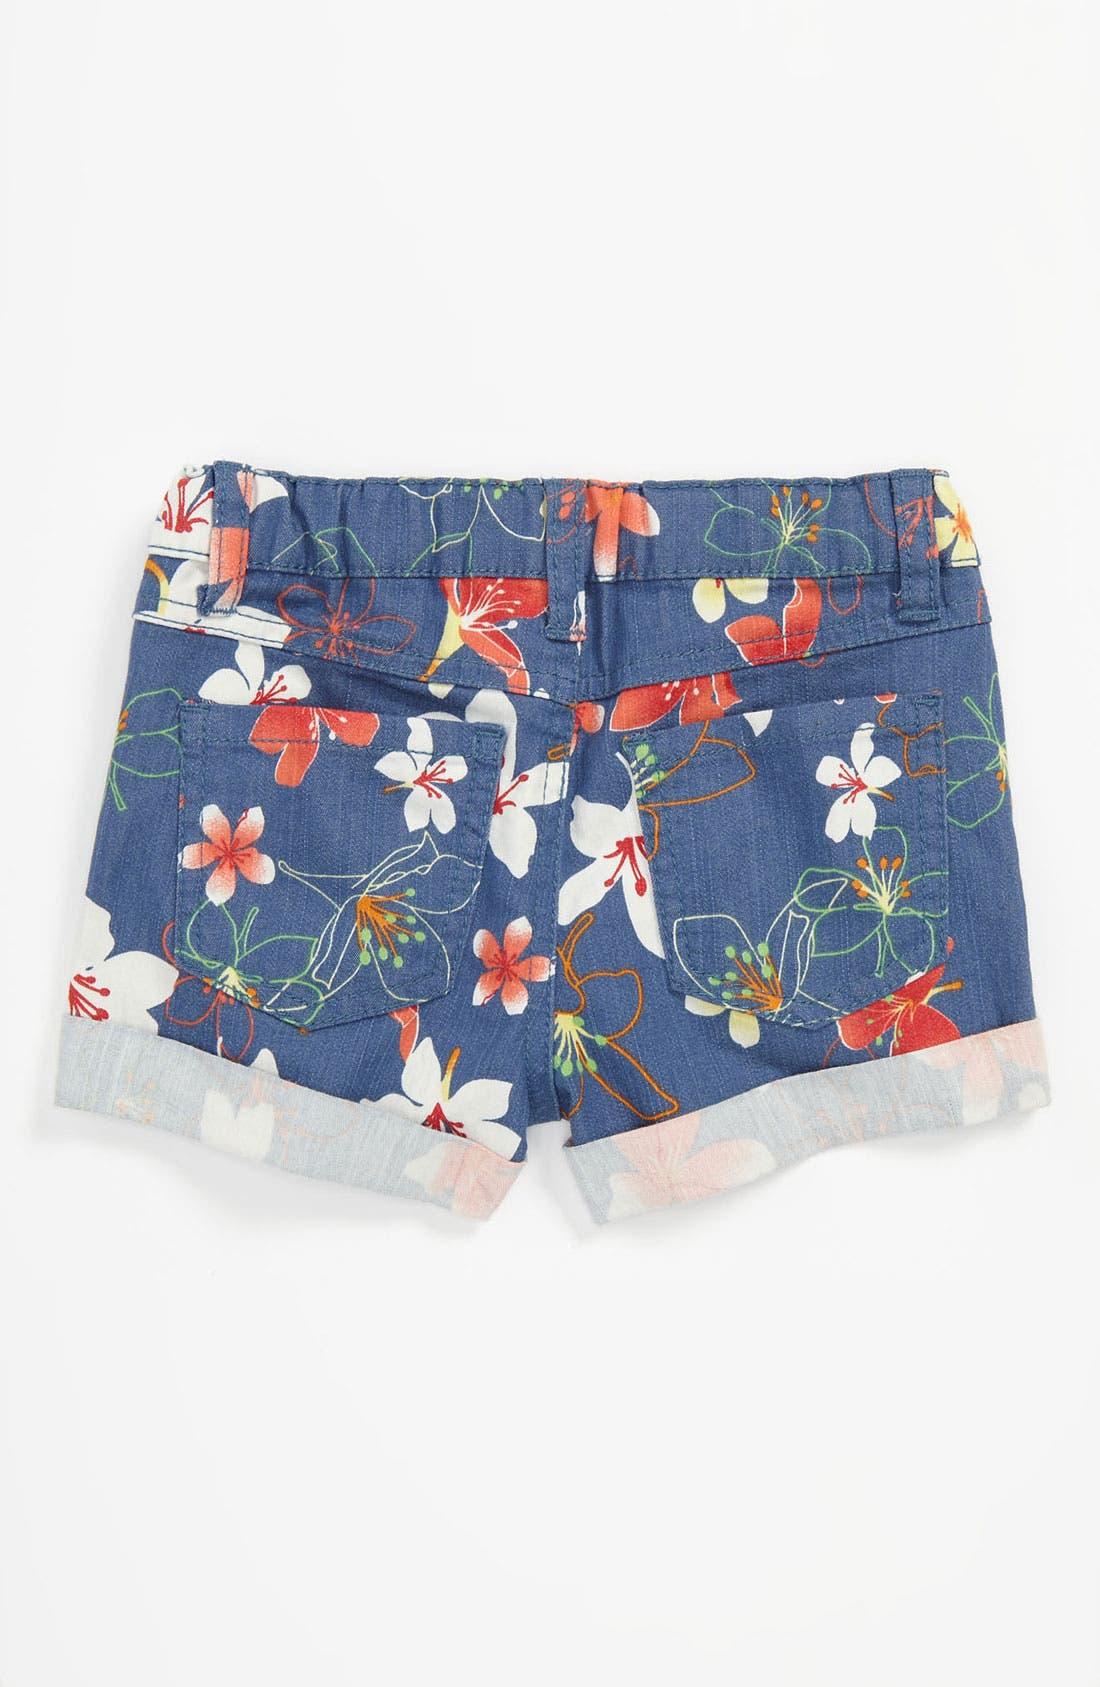 Alternate Image 1 Selected - Pumpkin Patch Floral Print Shorts (Toddler)